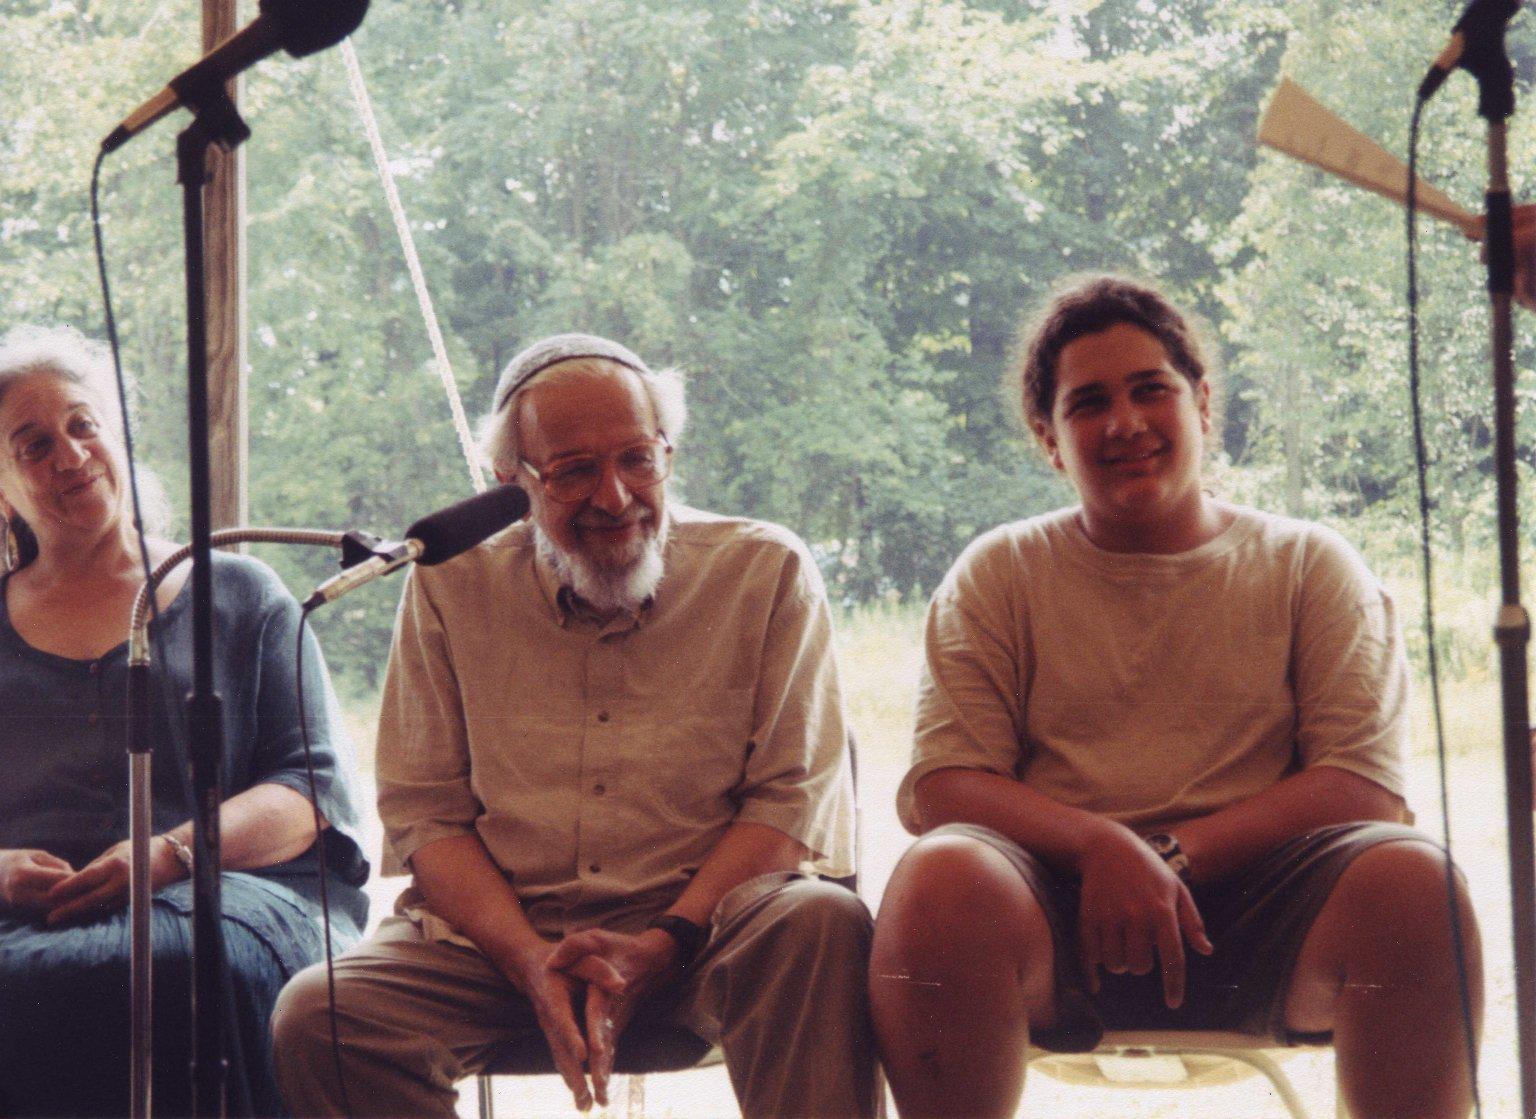 Candid photo of Eve Ilsen, Rabbi Zalman Schachter-Shalomi, and Yotam Schachter at Rabbi Zalman Schachter-Shalomi's 75th birthday celebration at Elat Chayyim, ca. 1999.